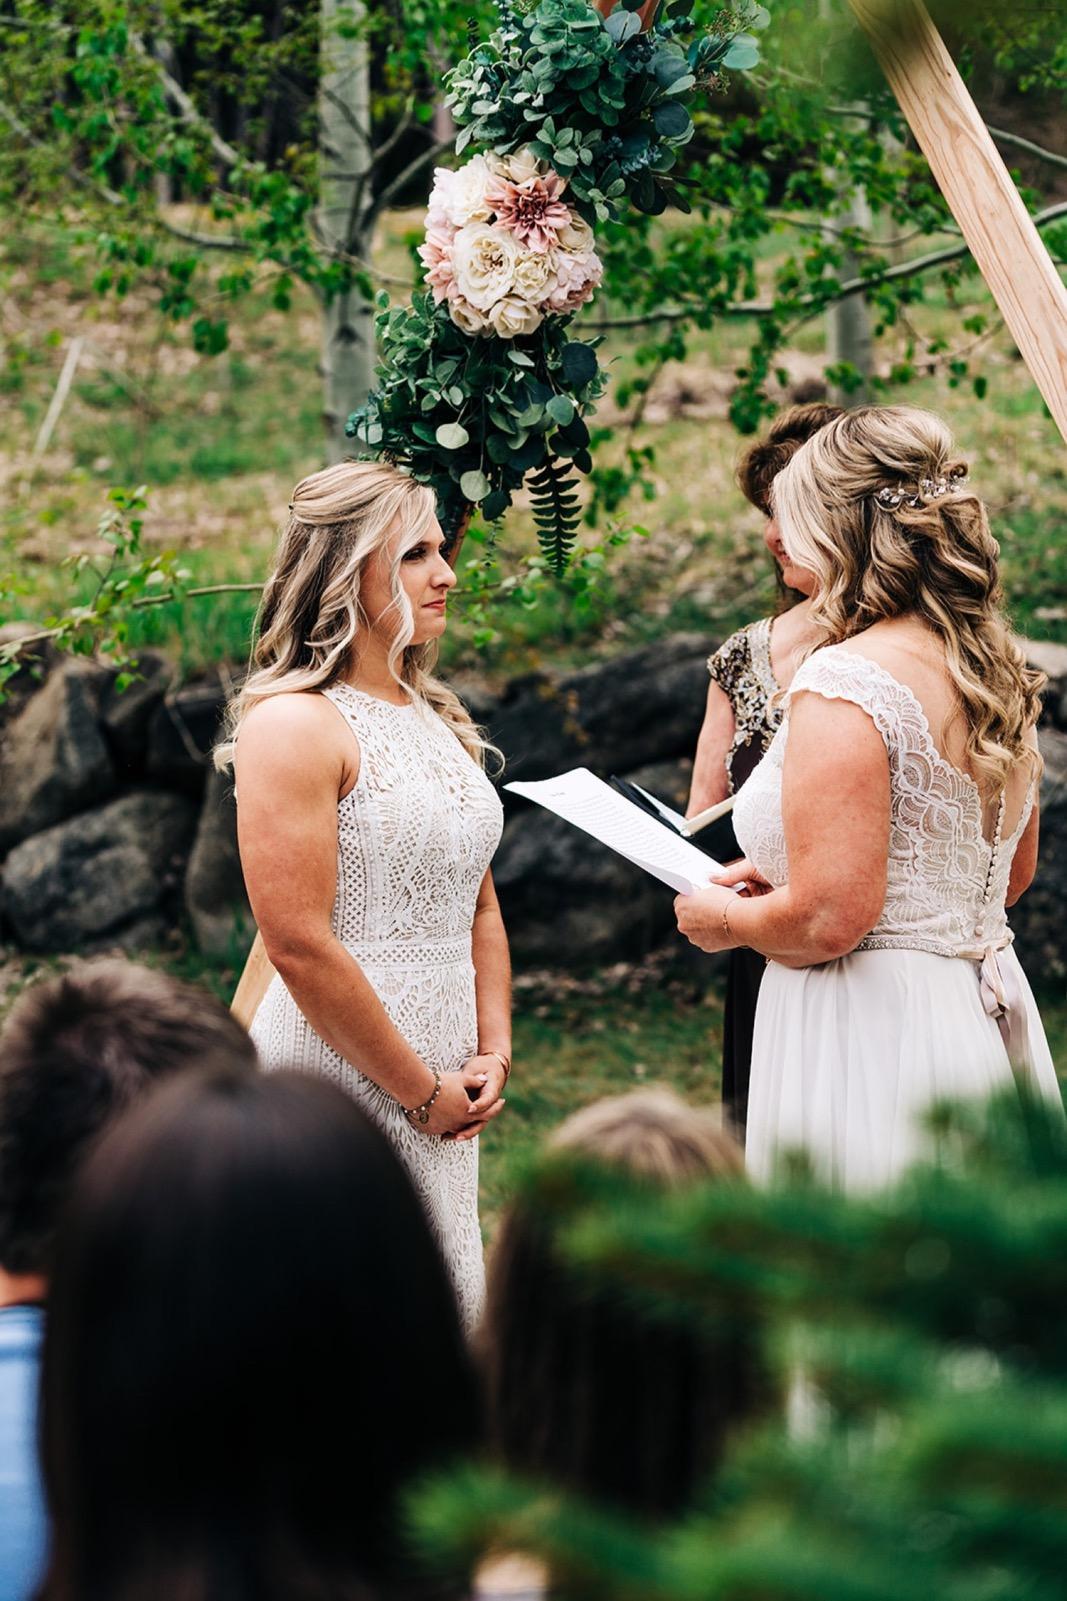 080_falissa_heather_wedding-195.jpg